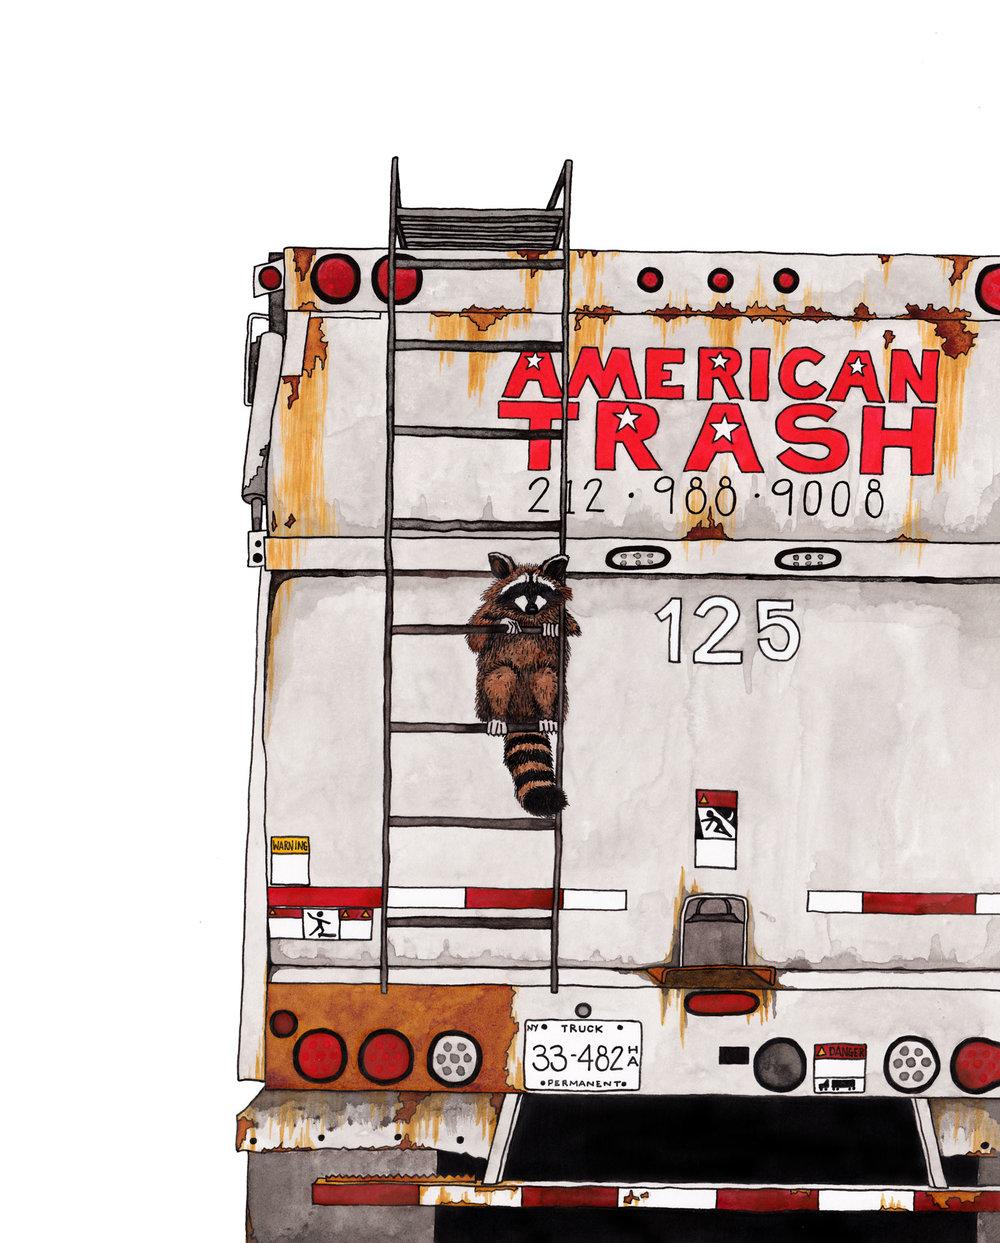 raccoon-american-trash-truck-garbage-illustration-matthew-woods.jpg